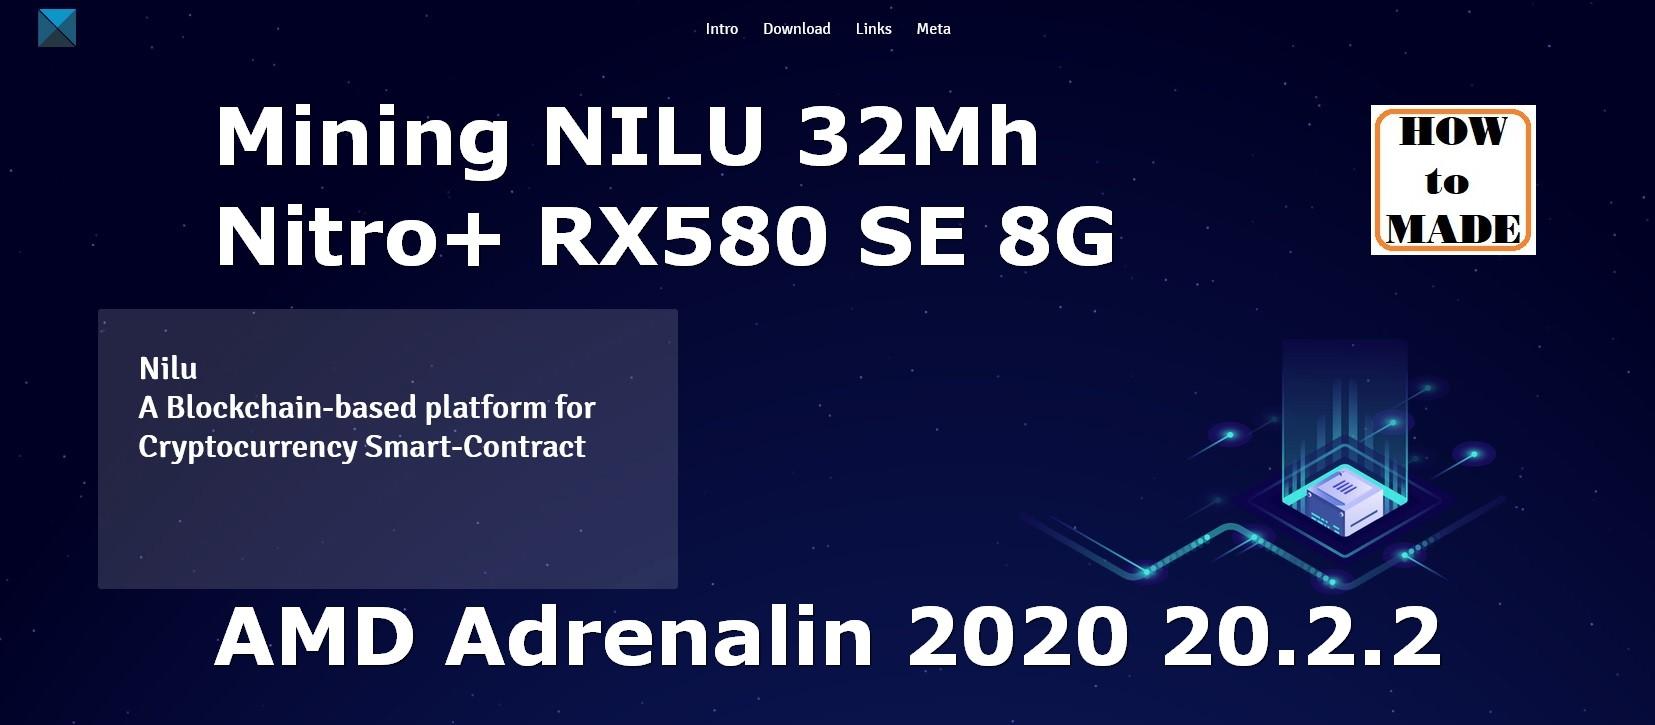 Mining NILU coin with AMD RX580 8G